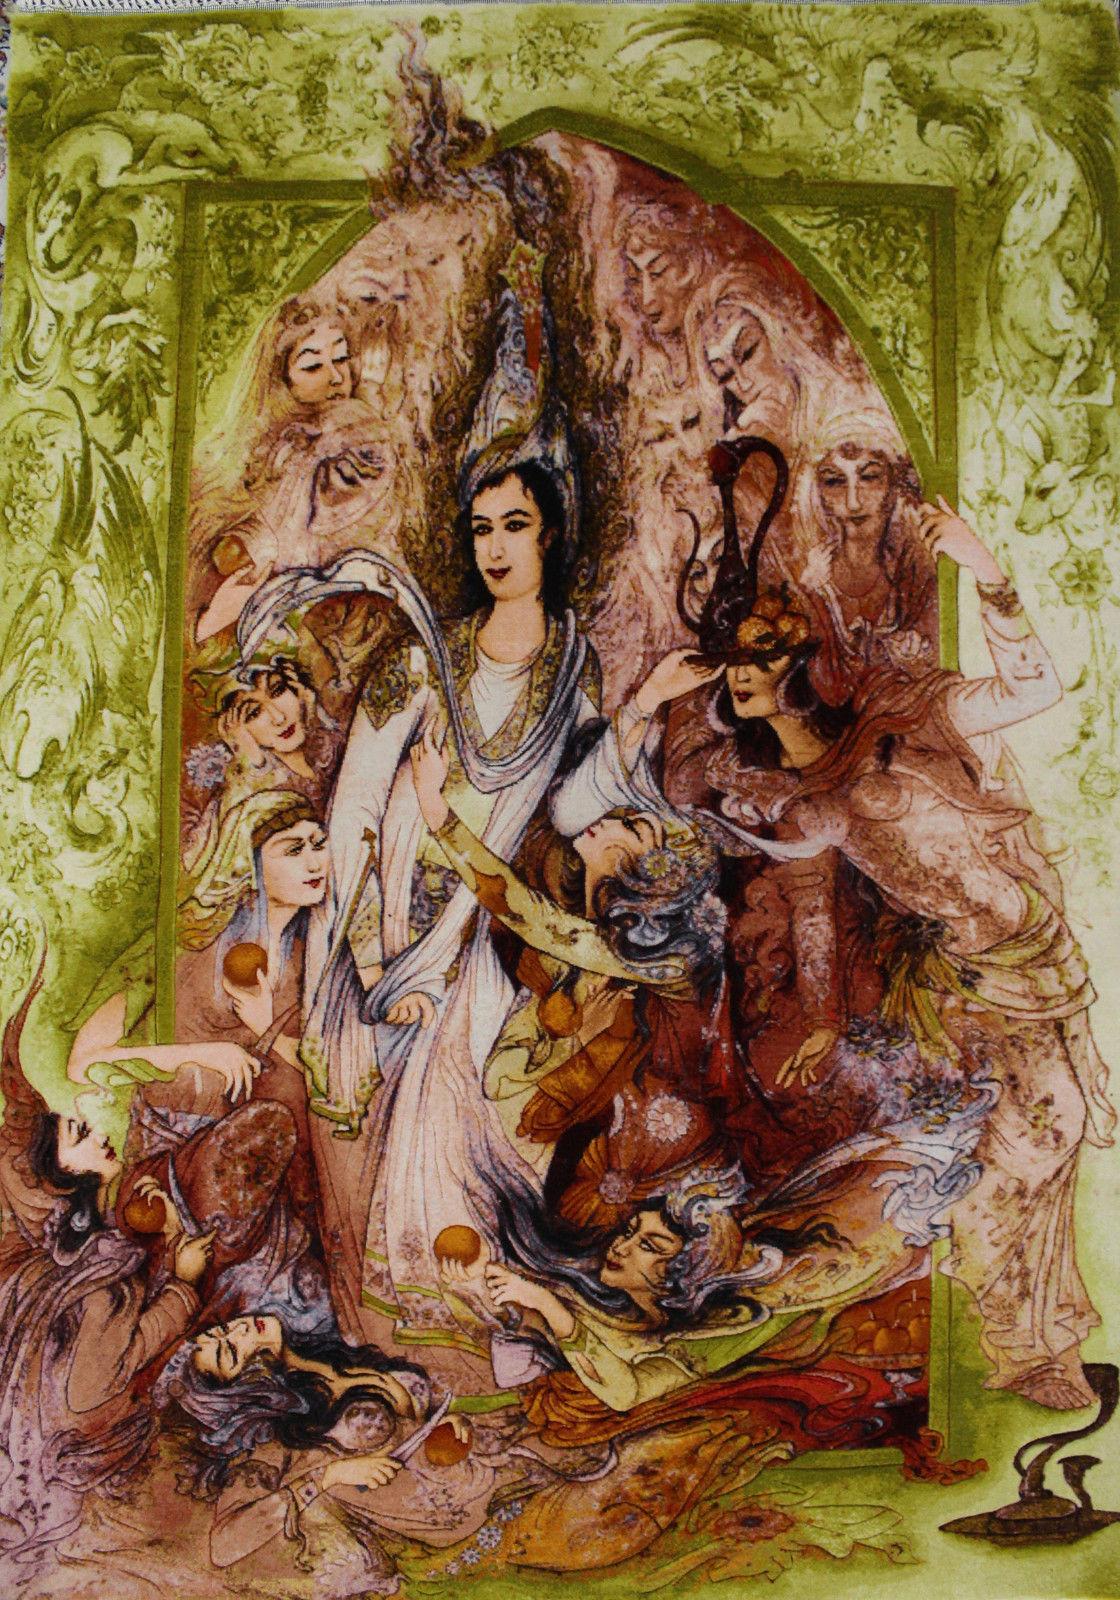 2'5″W x 3'8″H Handmade Wool and Silk FARSH JUSEF MINIATOR Persian Tableau Rug Tapestry Wall Hanging 12980830